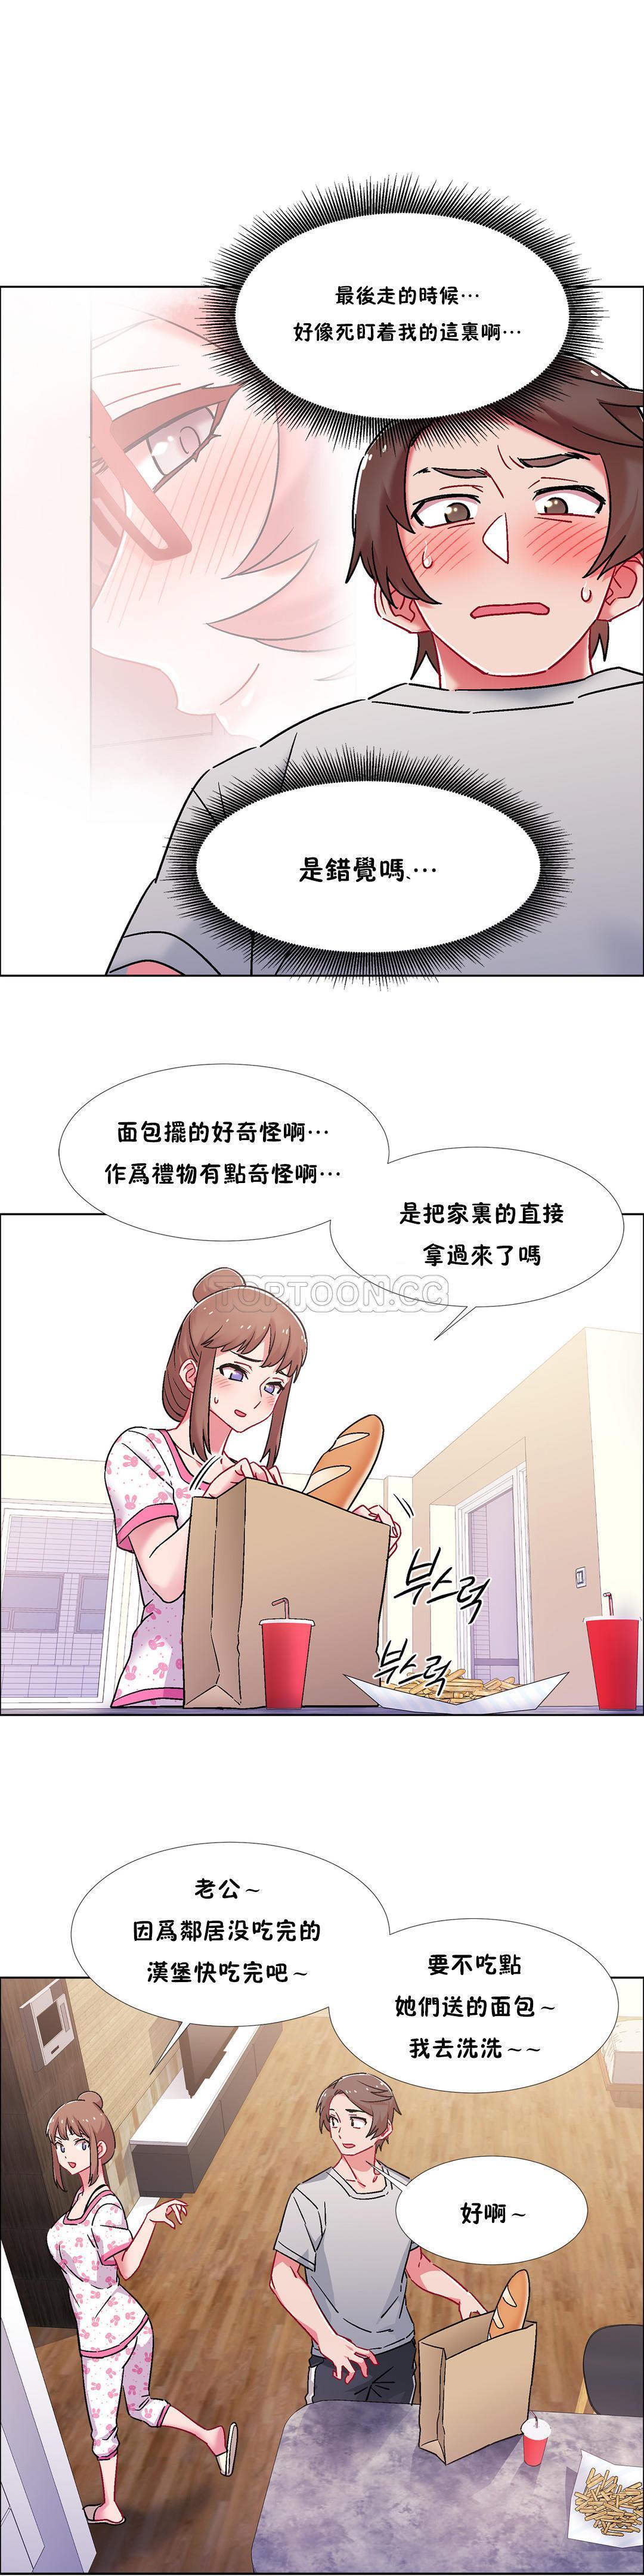 [Studio Wannabe] Rental Girls | 出租女郎 Ch. 33-58 [Chinese]  第二季 完结 265